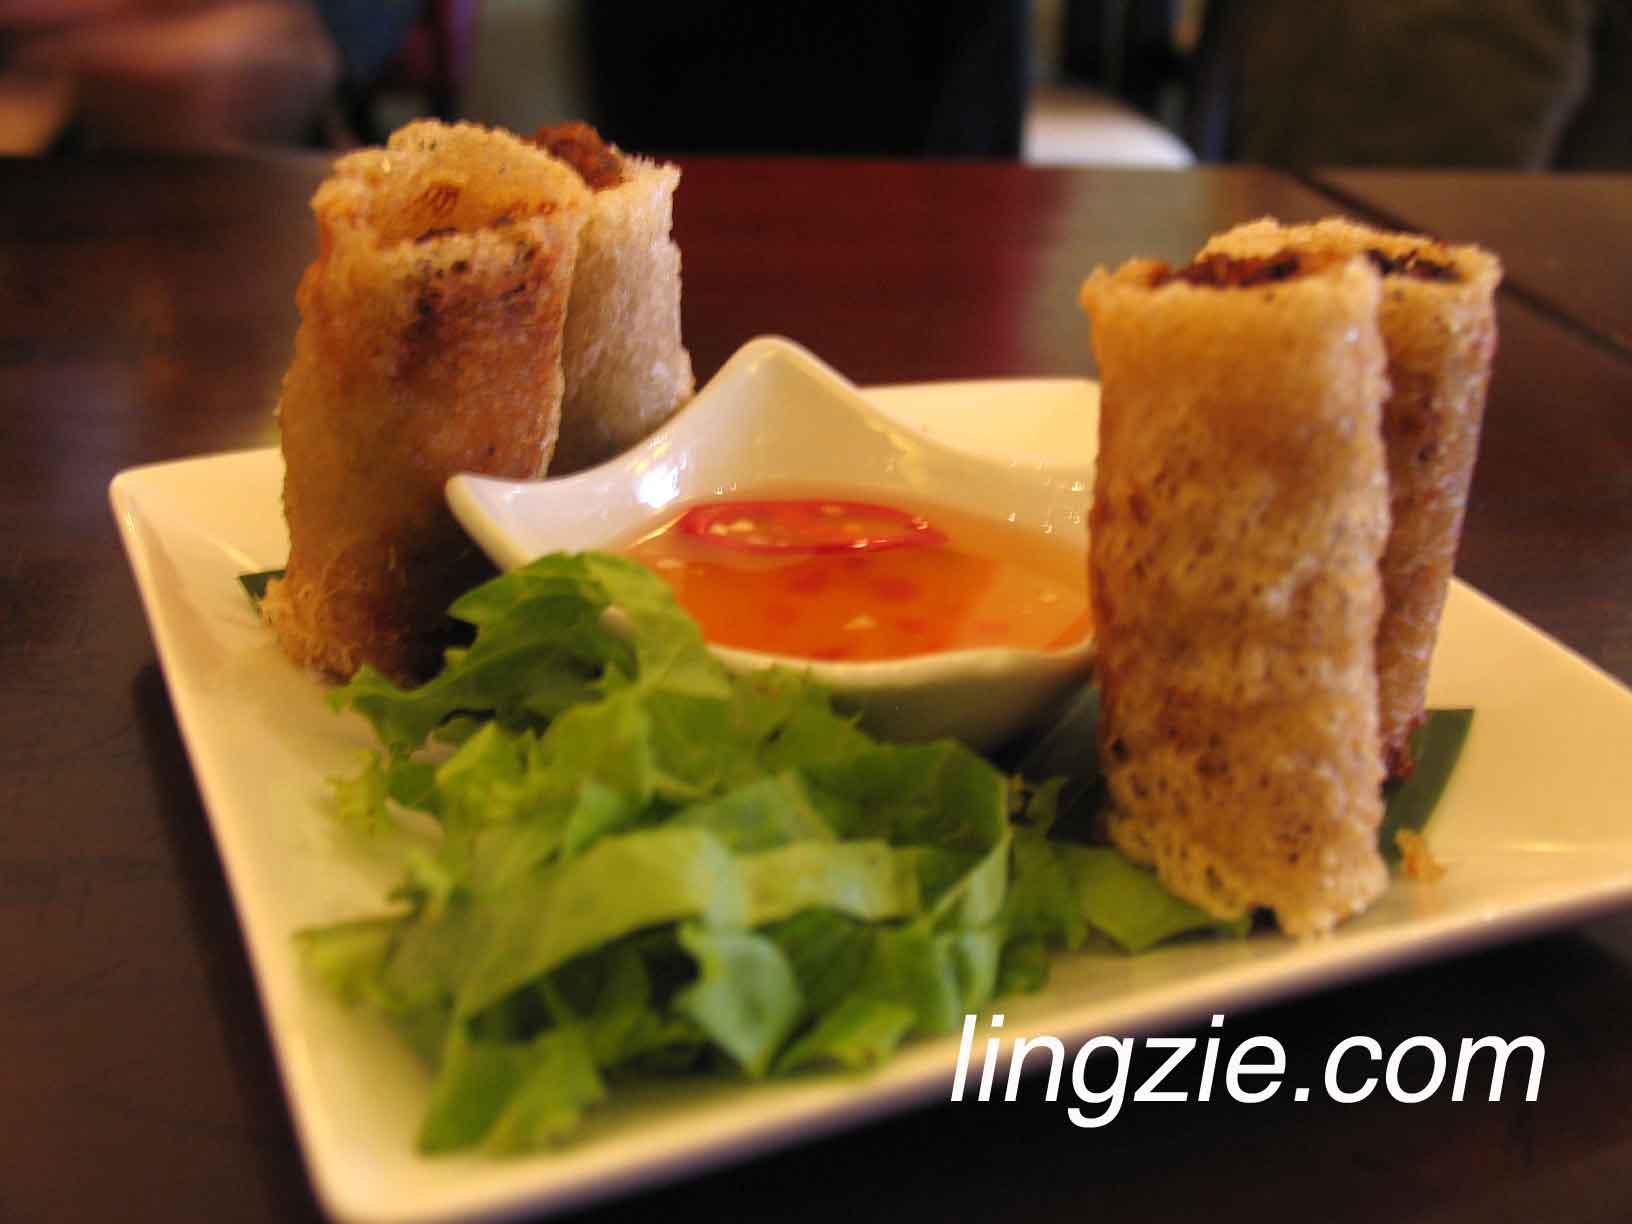 Crispy Gourmet Seafood Roll (RM9.80)